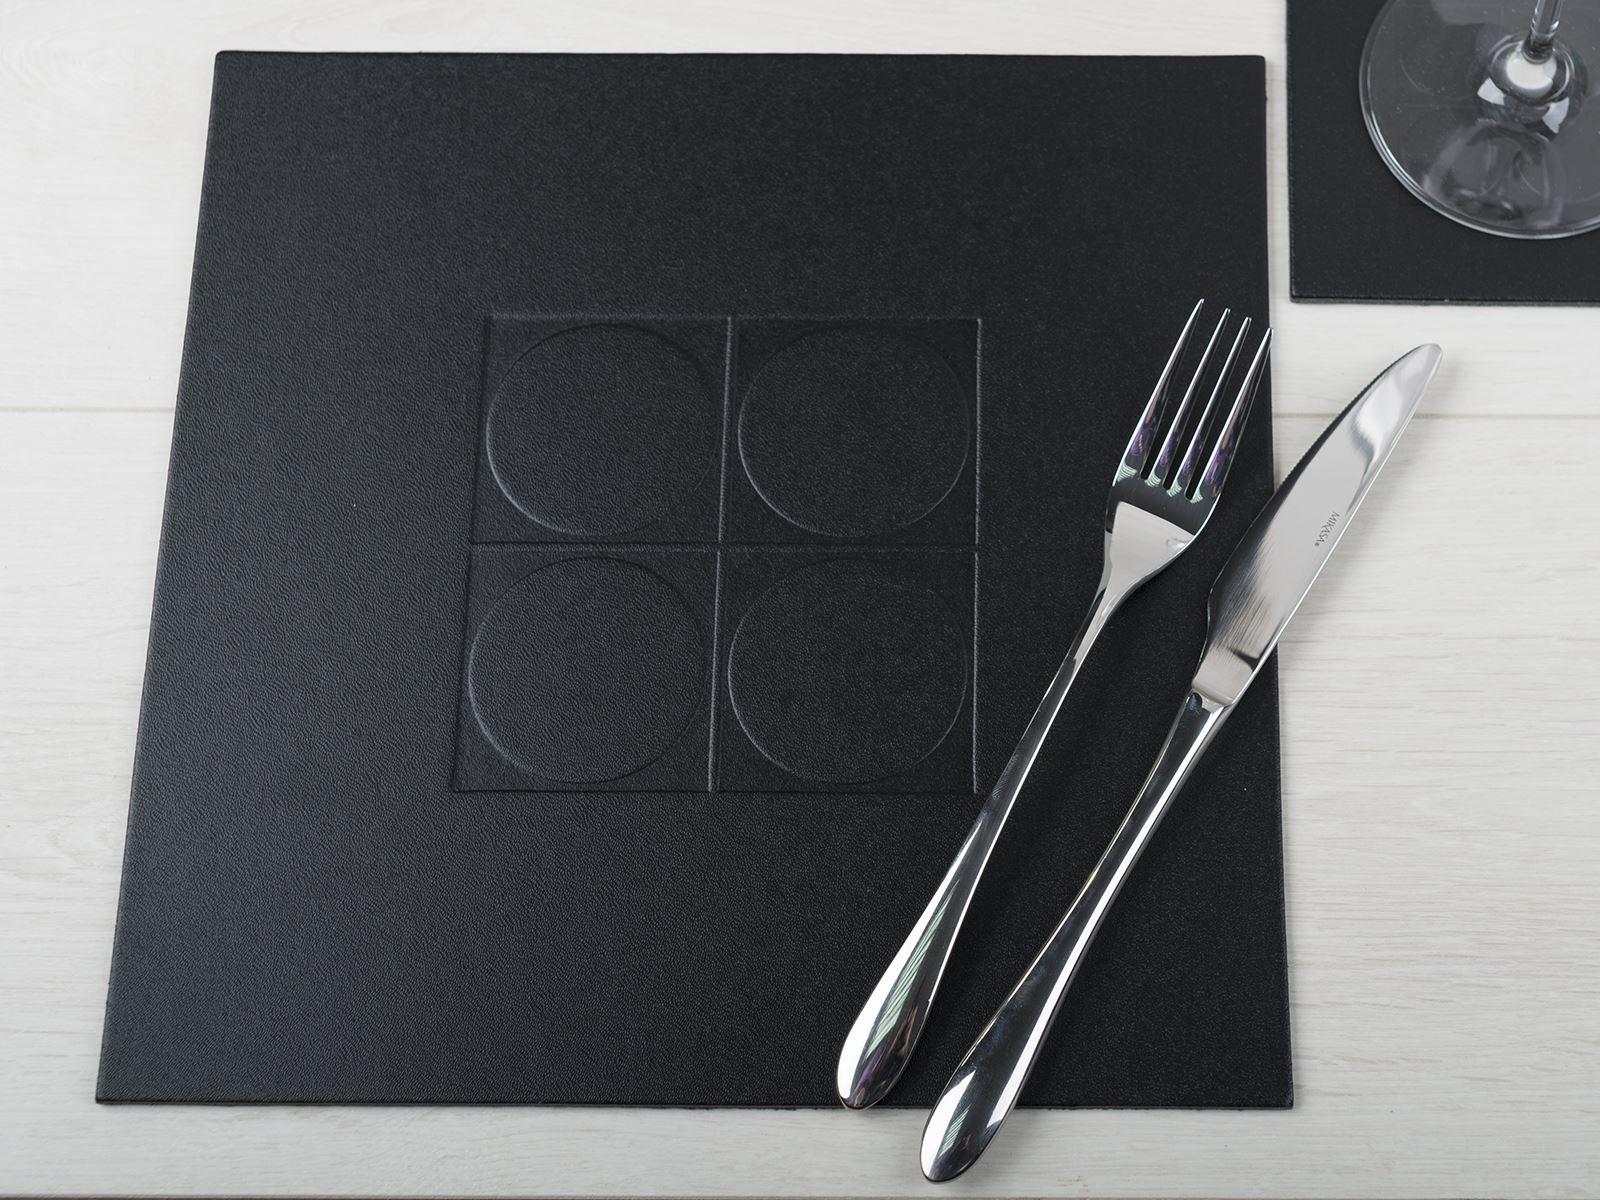 set of 4 black embossed square placemats leatherboard table mats ebay. Black Bedroom Furniture Sets. Home Design Ideas